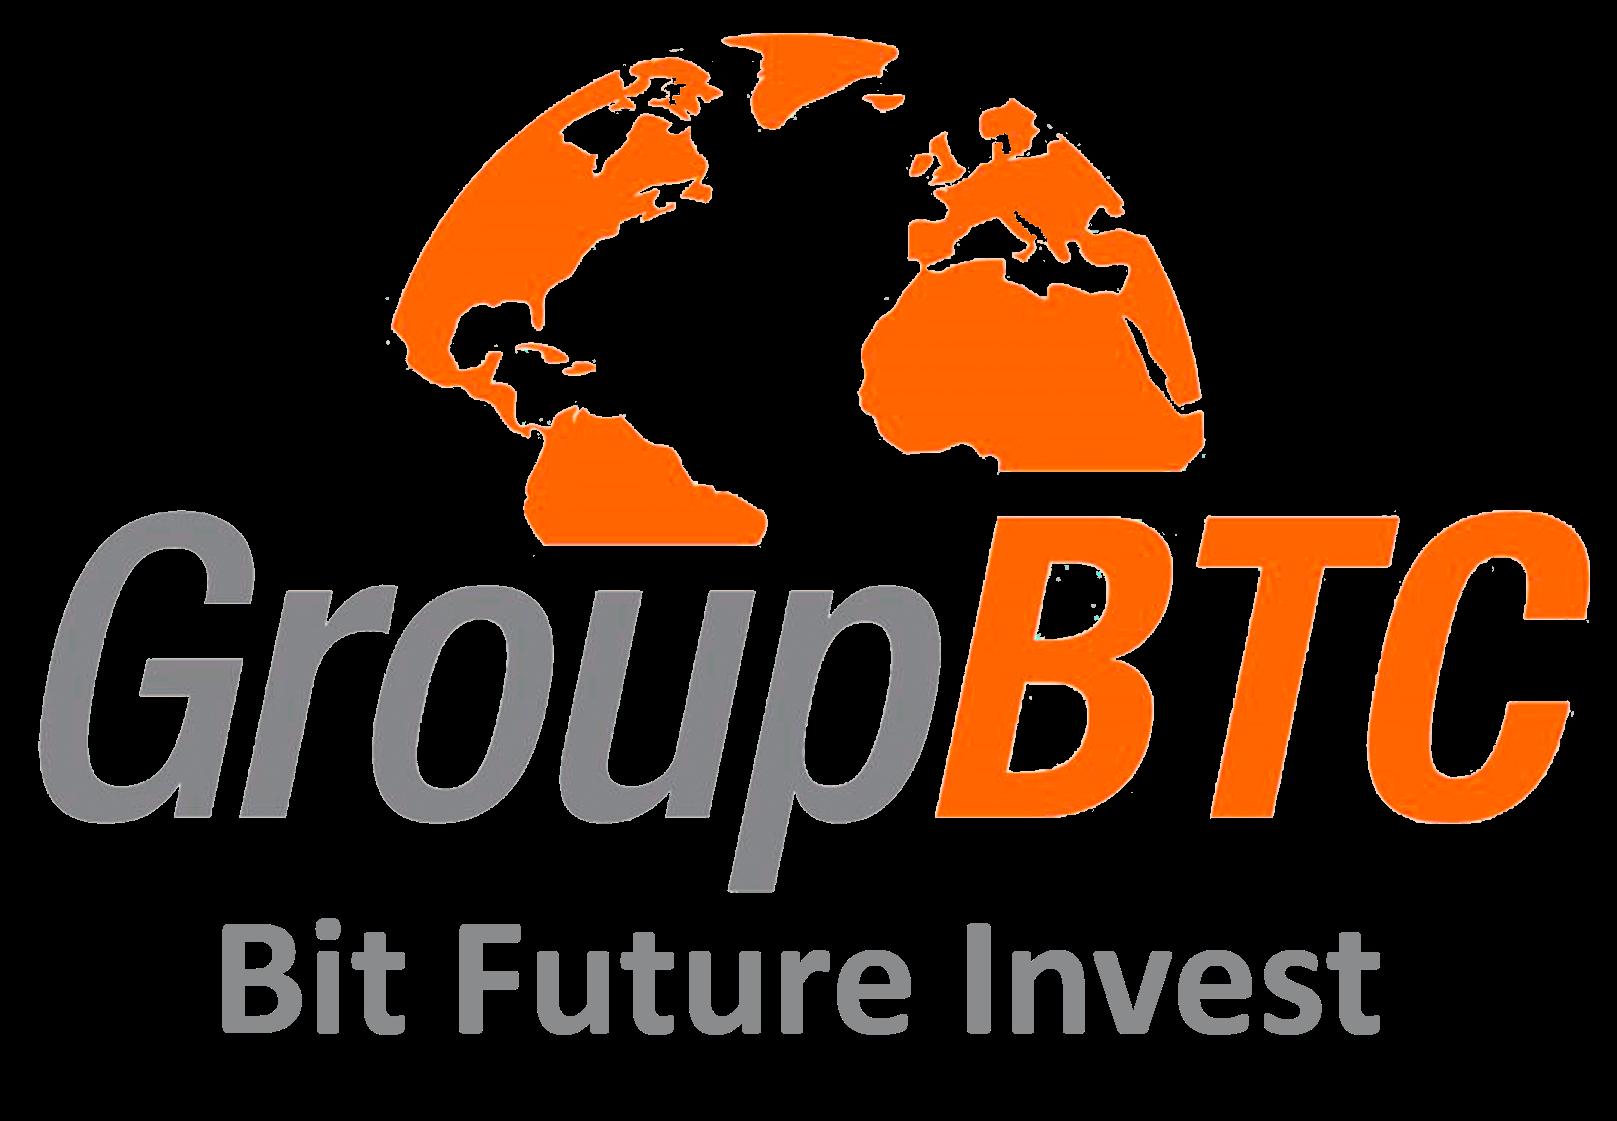 Bitfuture Invest